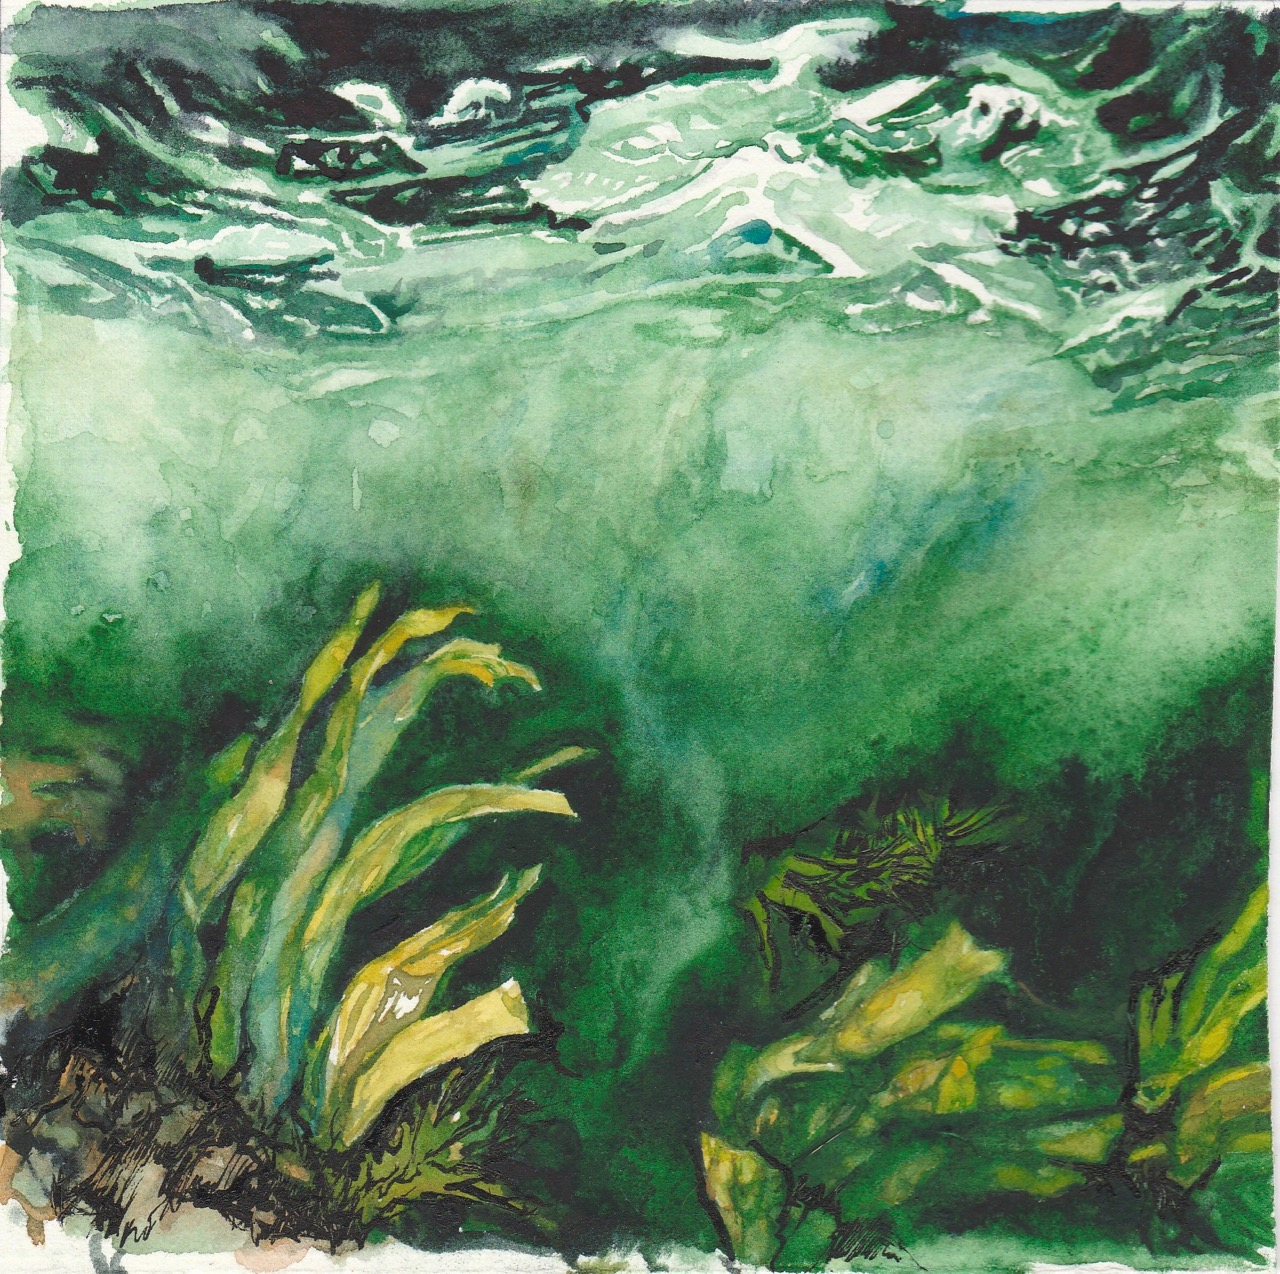 Painting of the ocean floor by Leanne Cadden